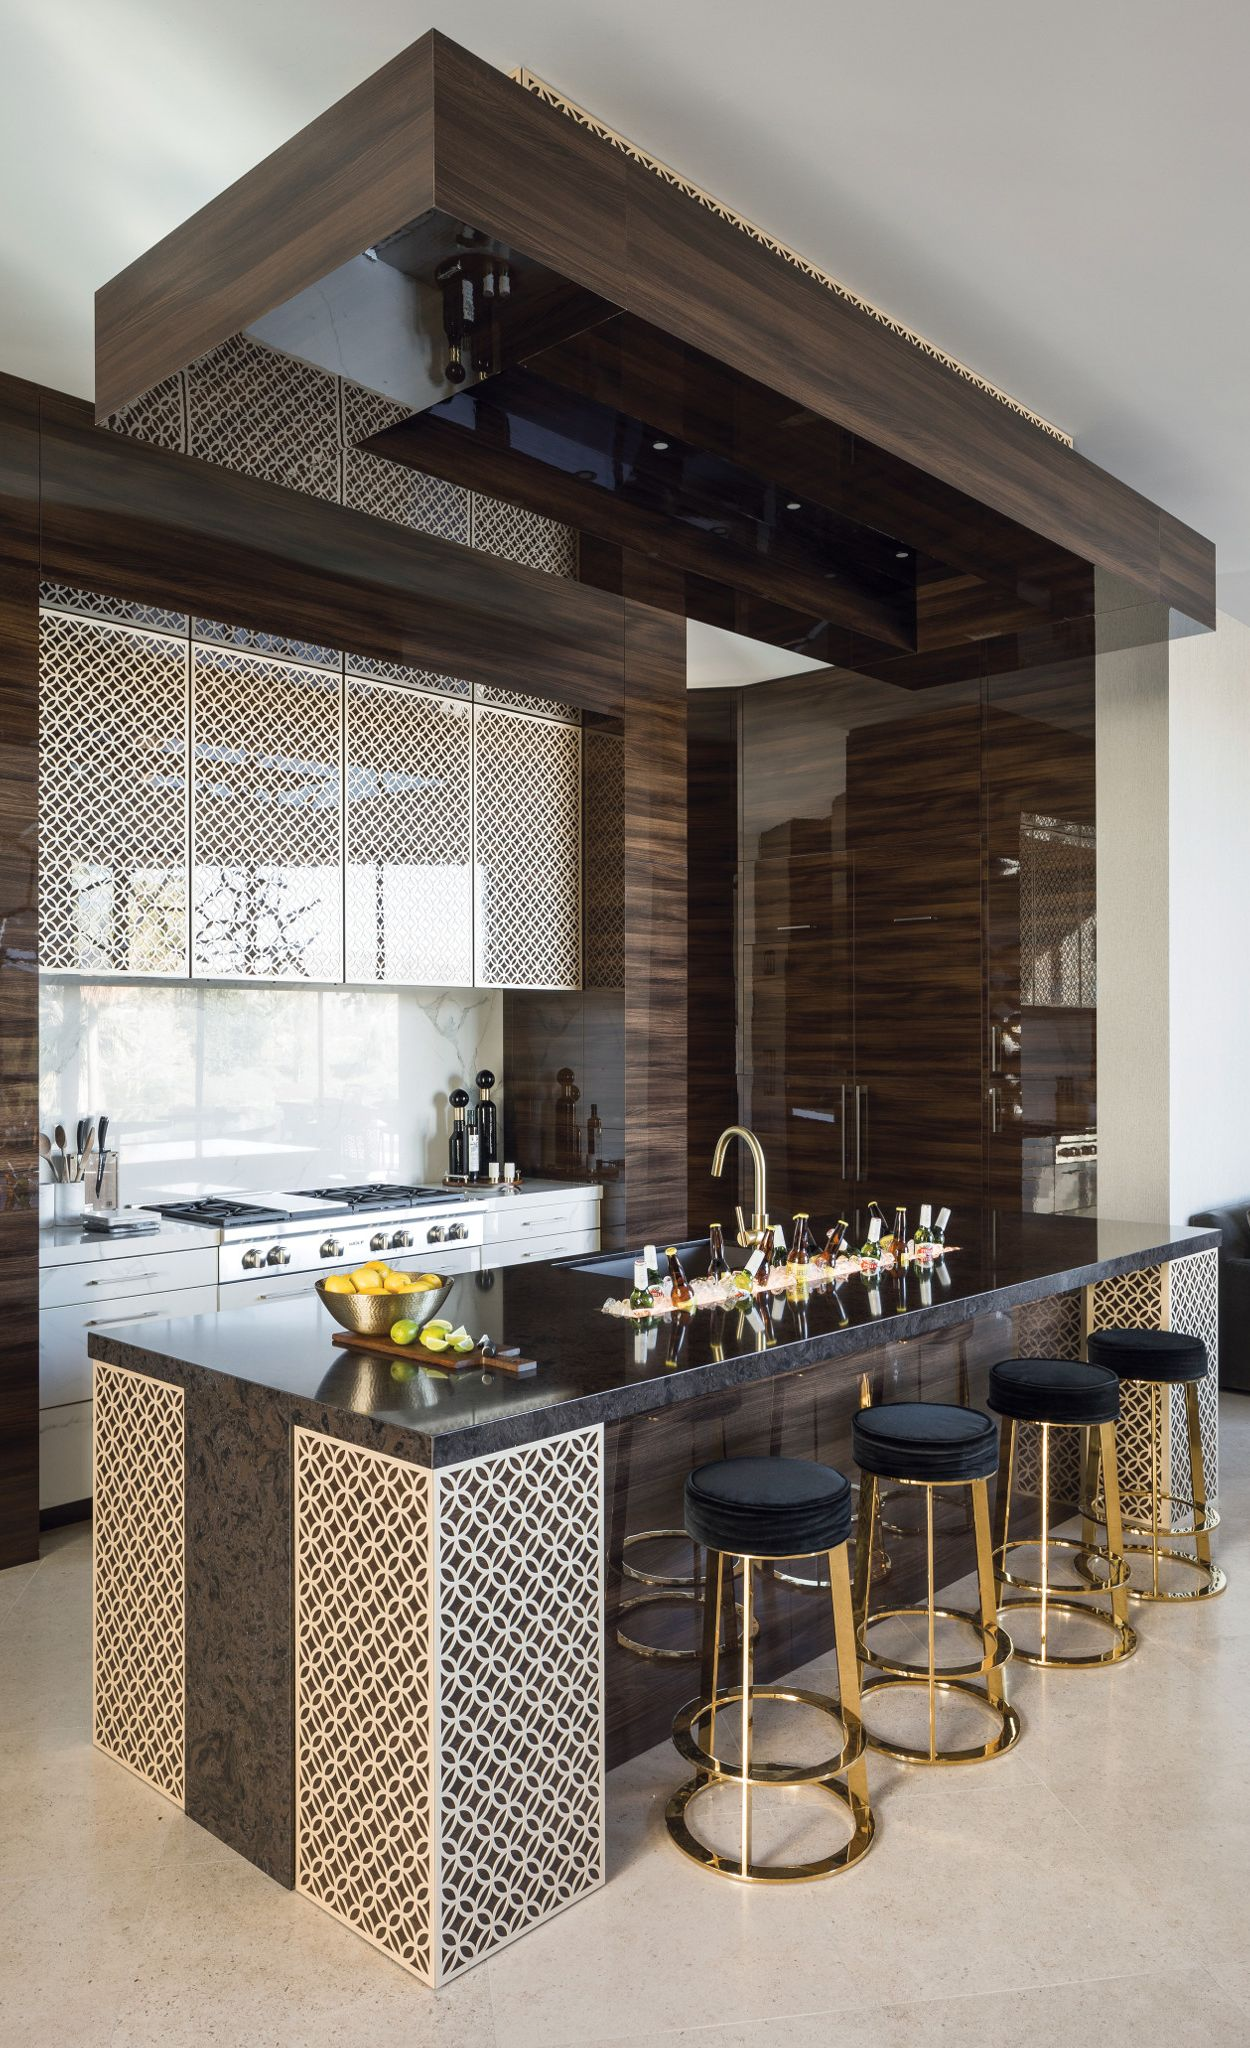 Vintage modern kitchen with Wellington™ island.